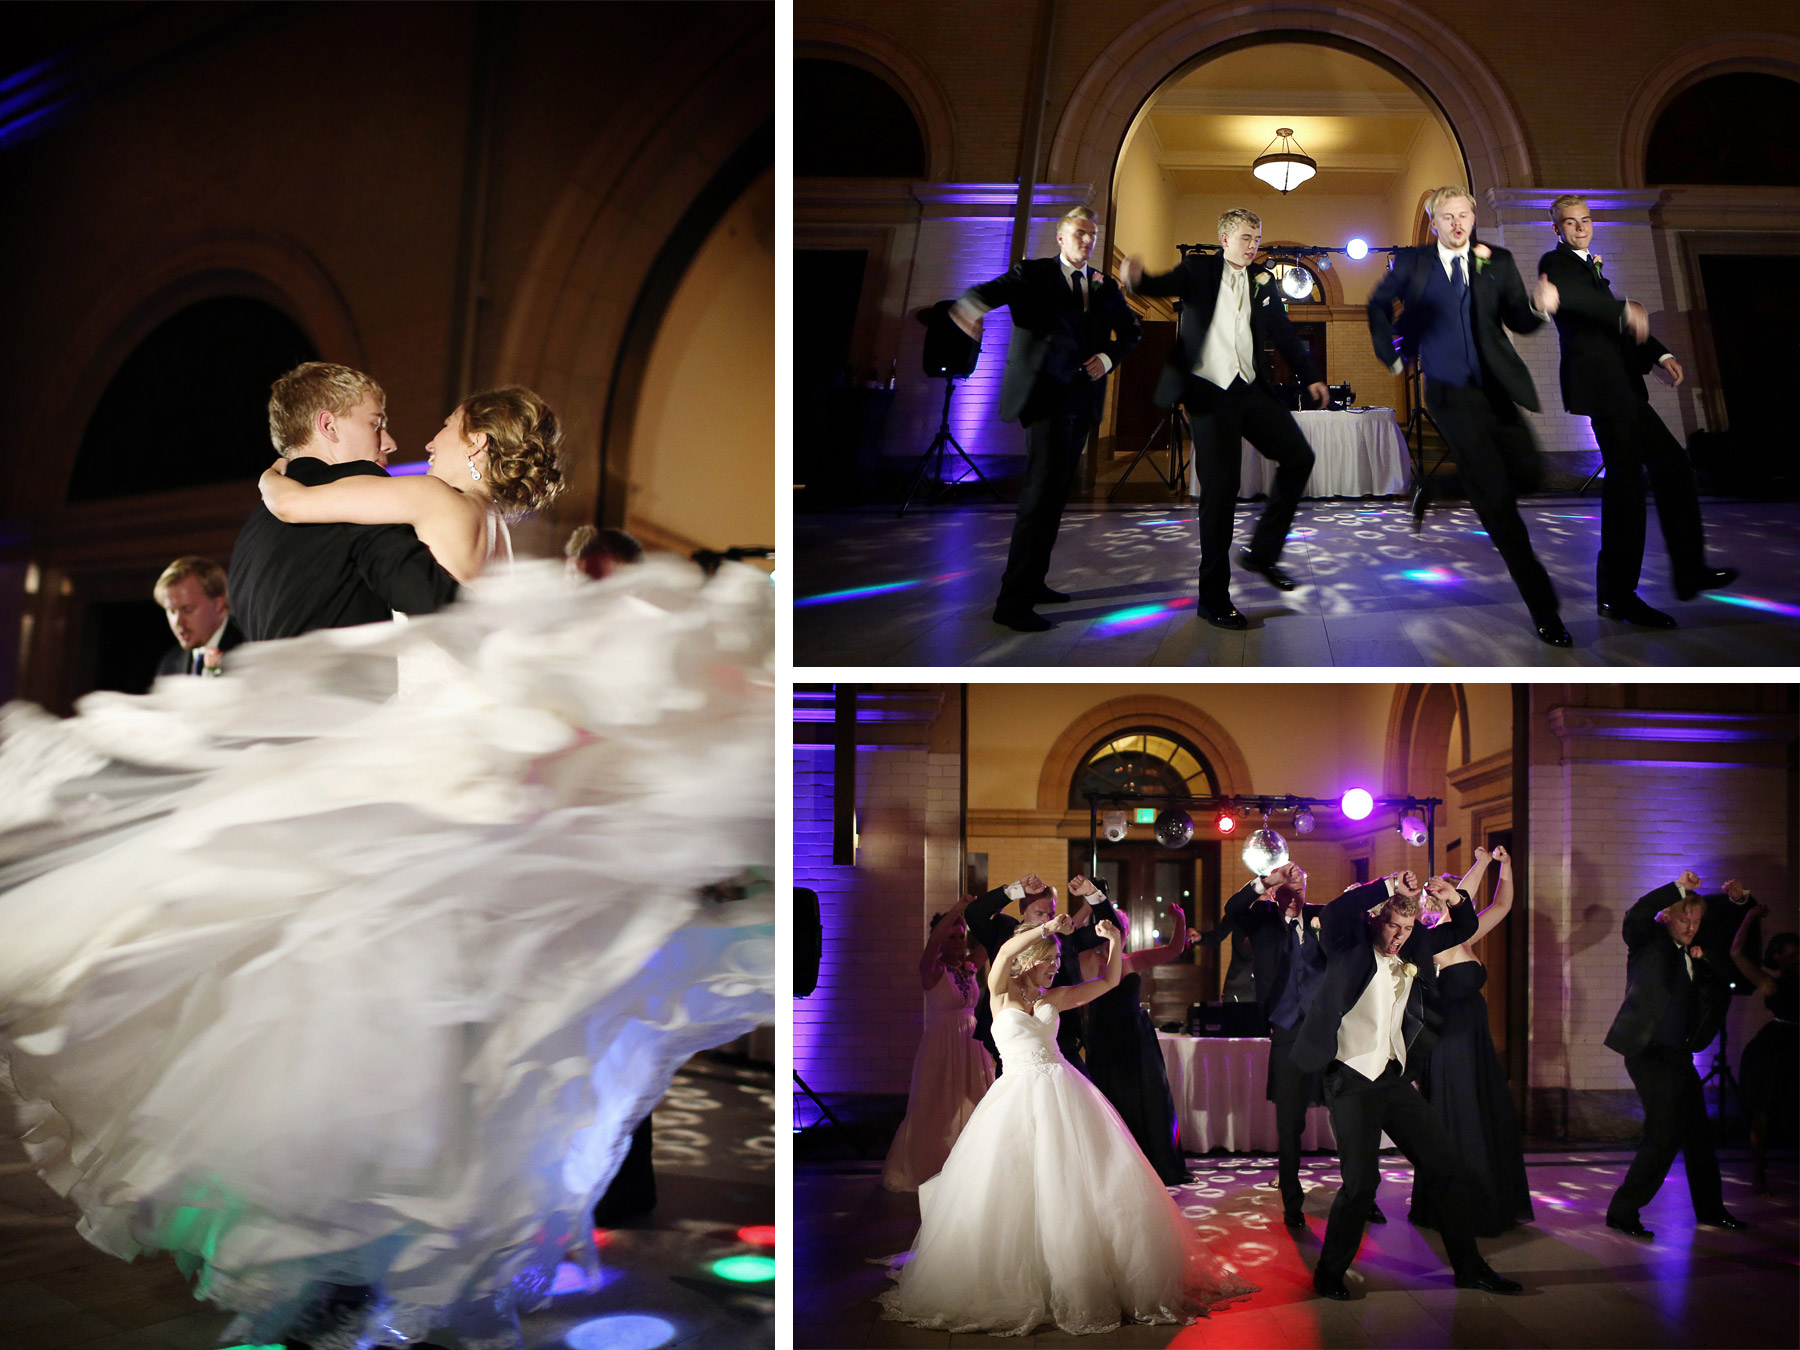 14-Minneapolis-Minnesota-Wedding-Photography-by-Vick-Photography-The-Depot-Reception-Dance-Courtney-&-John.jpg